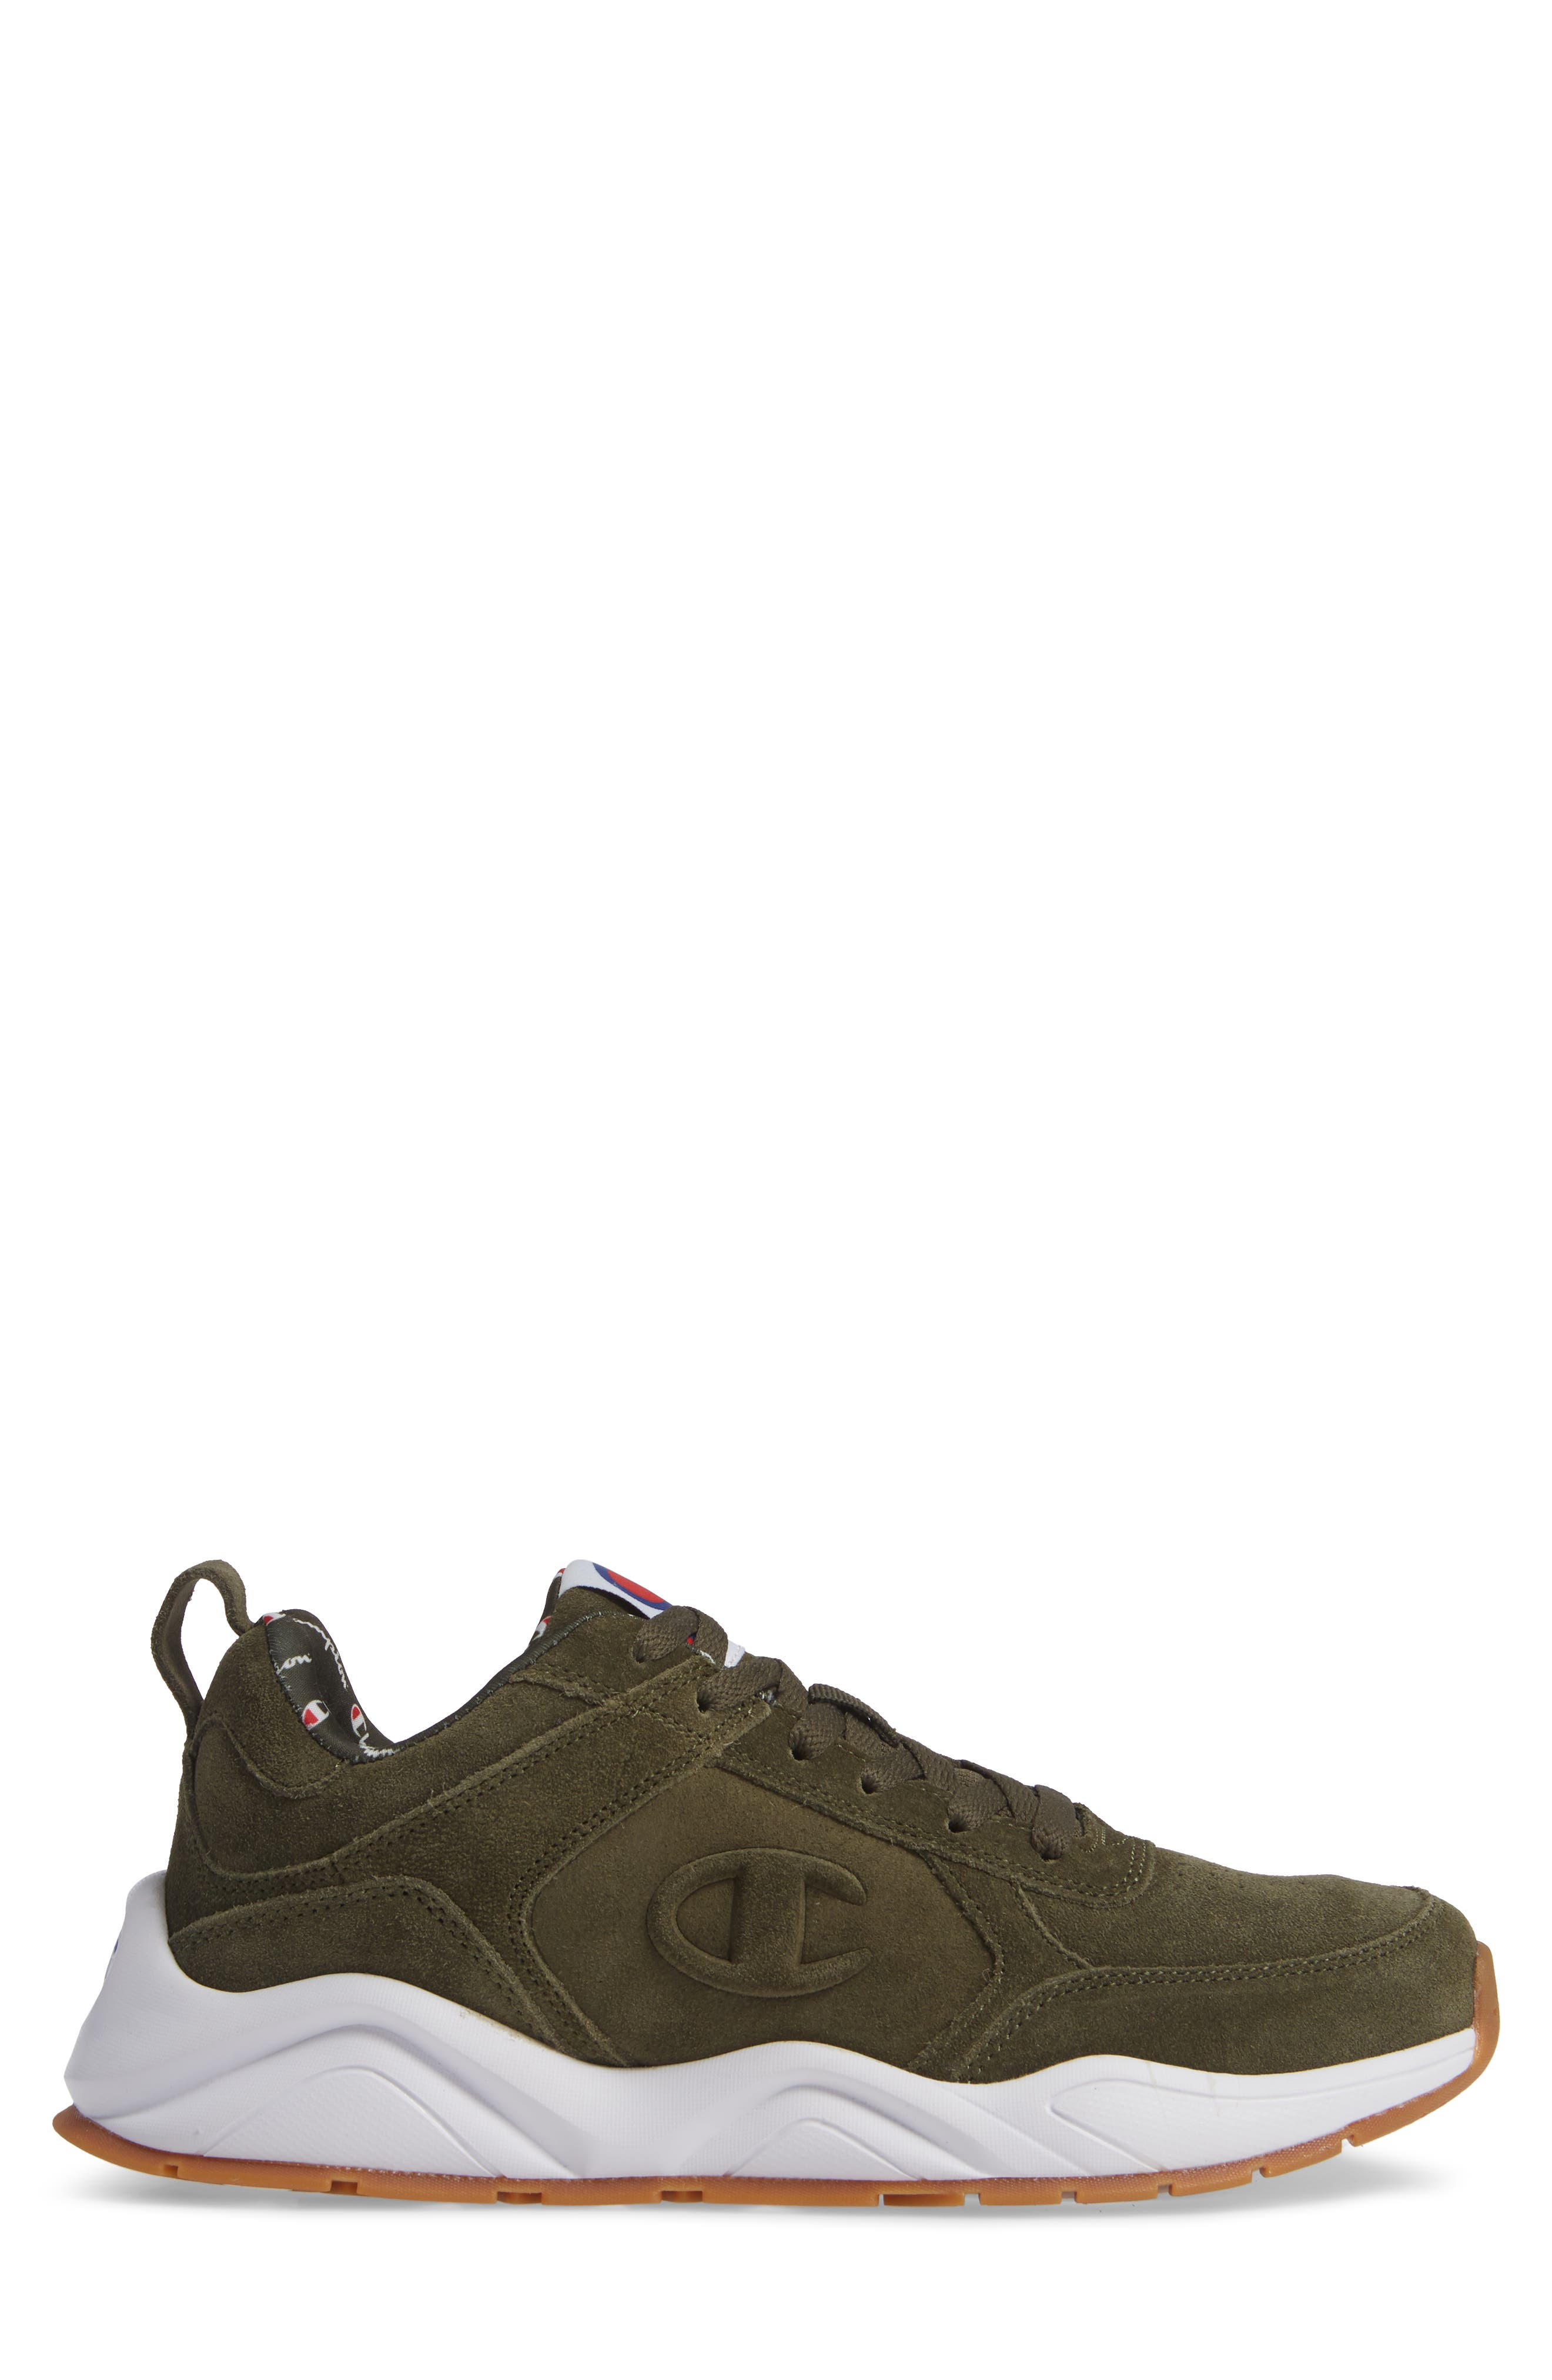 93Eighteen Sneaker,                             Alternate thumbnail 3, color,                             HIKER GREEN SUEDE